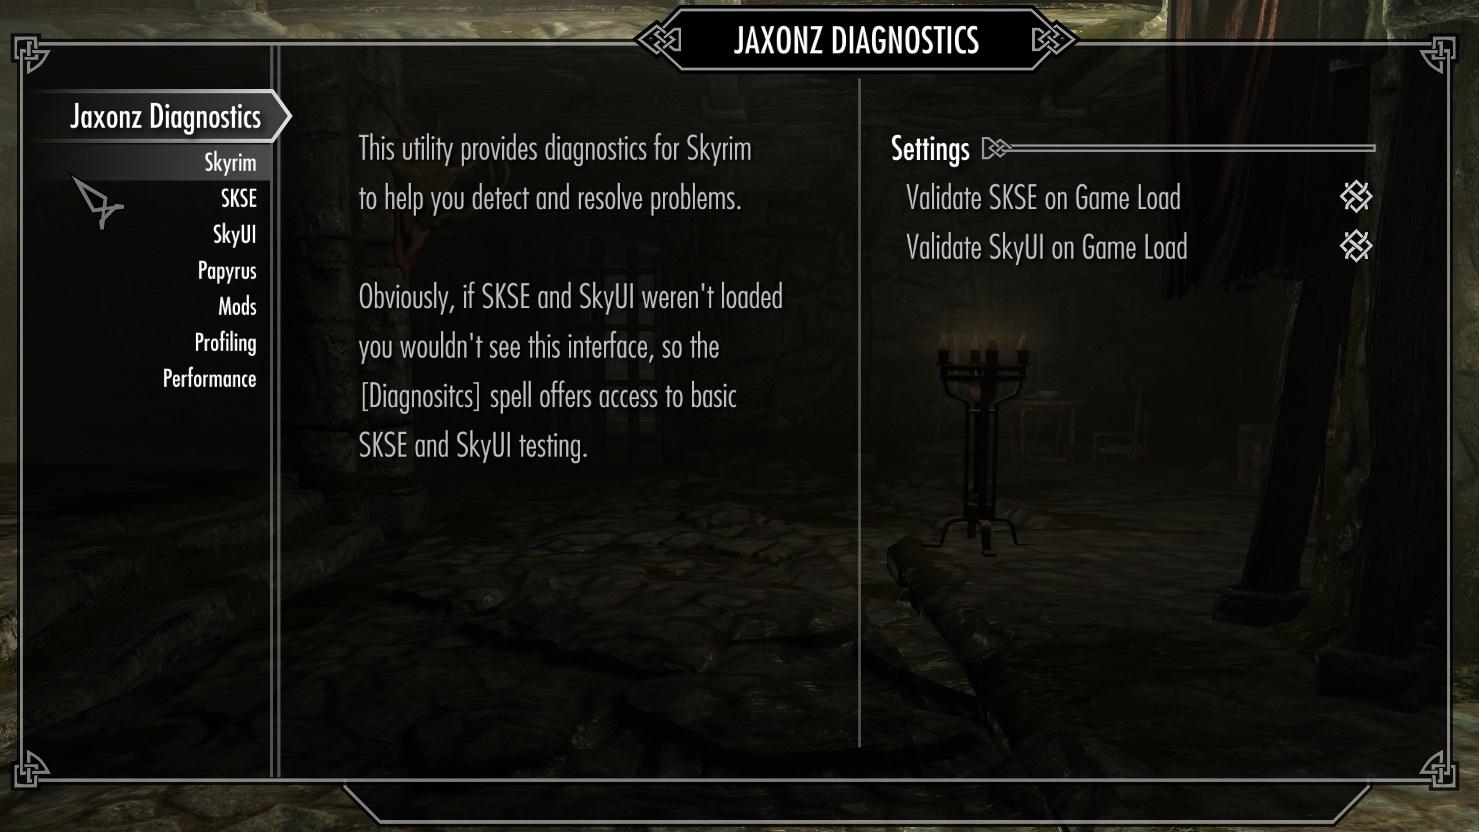 Jaxonz Diagnostics